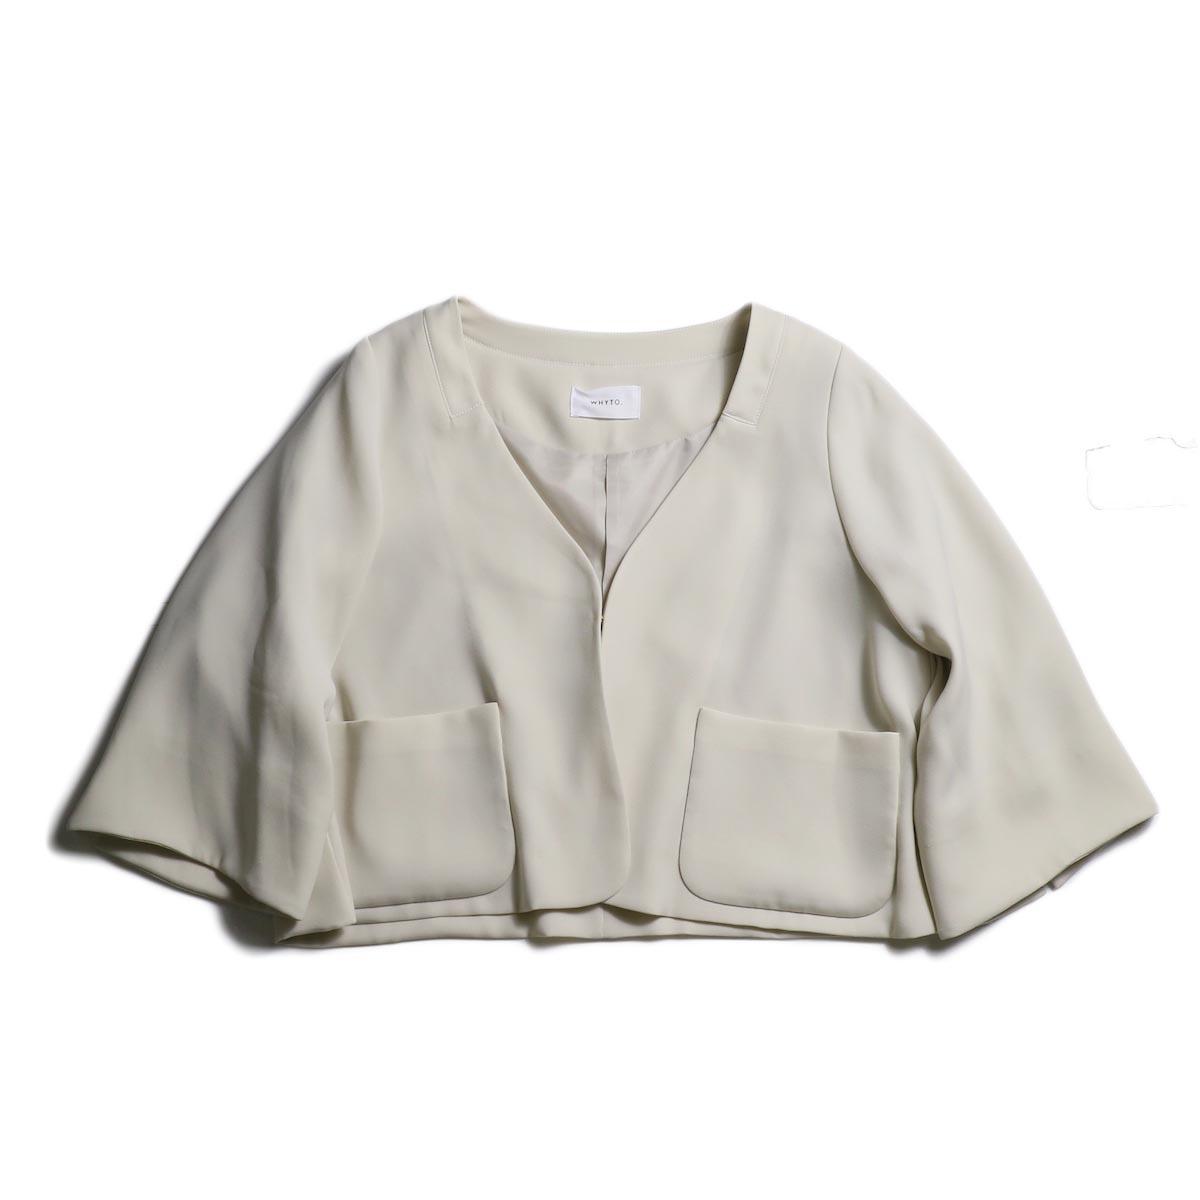 WHYTO. / Double Cloth Satin Short Jacket (Lt.Beige)